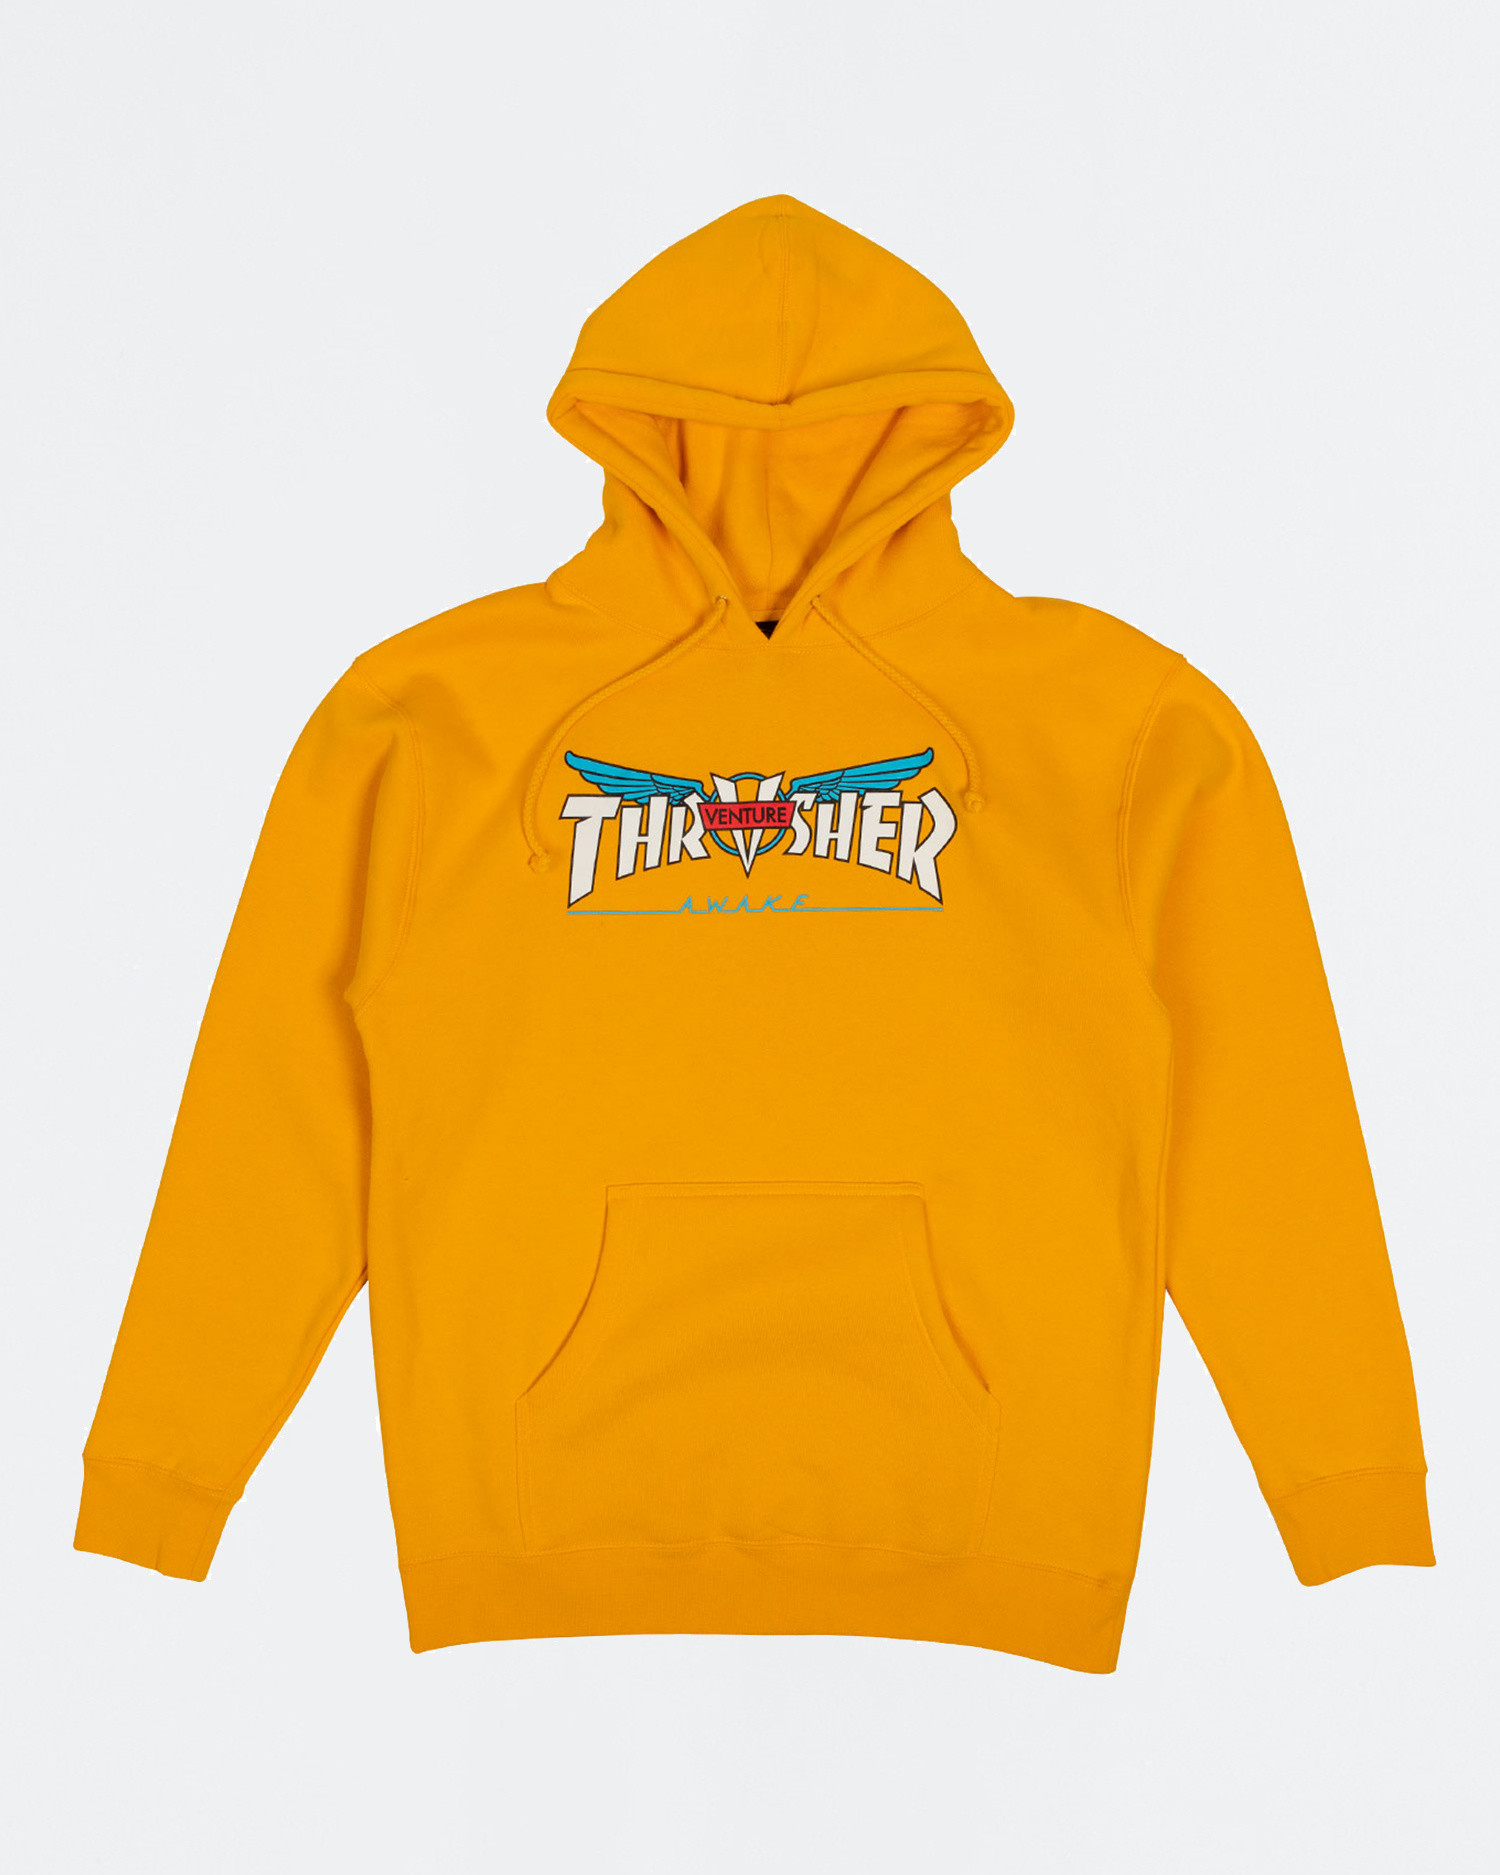 Thrasher X Venture Collab Hoodie Gold